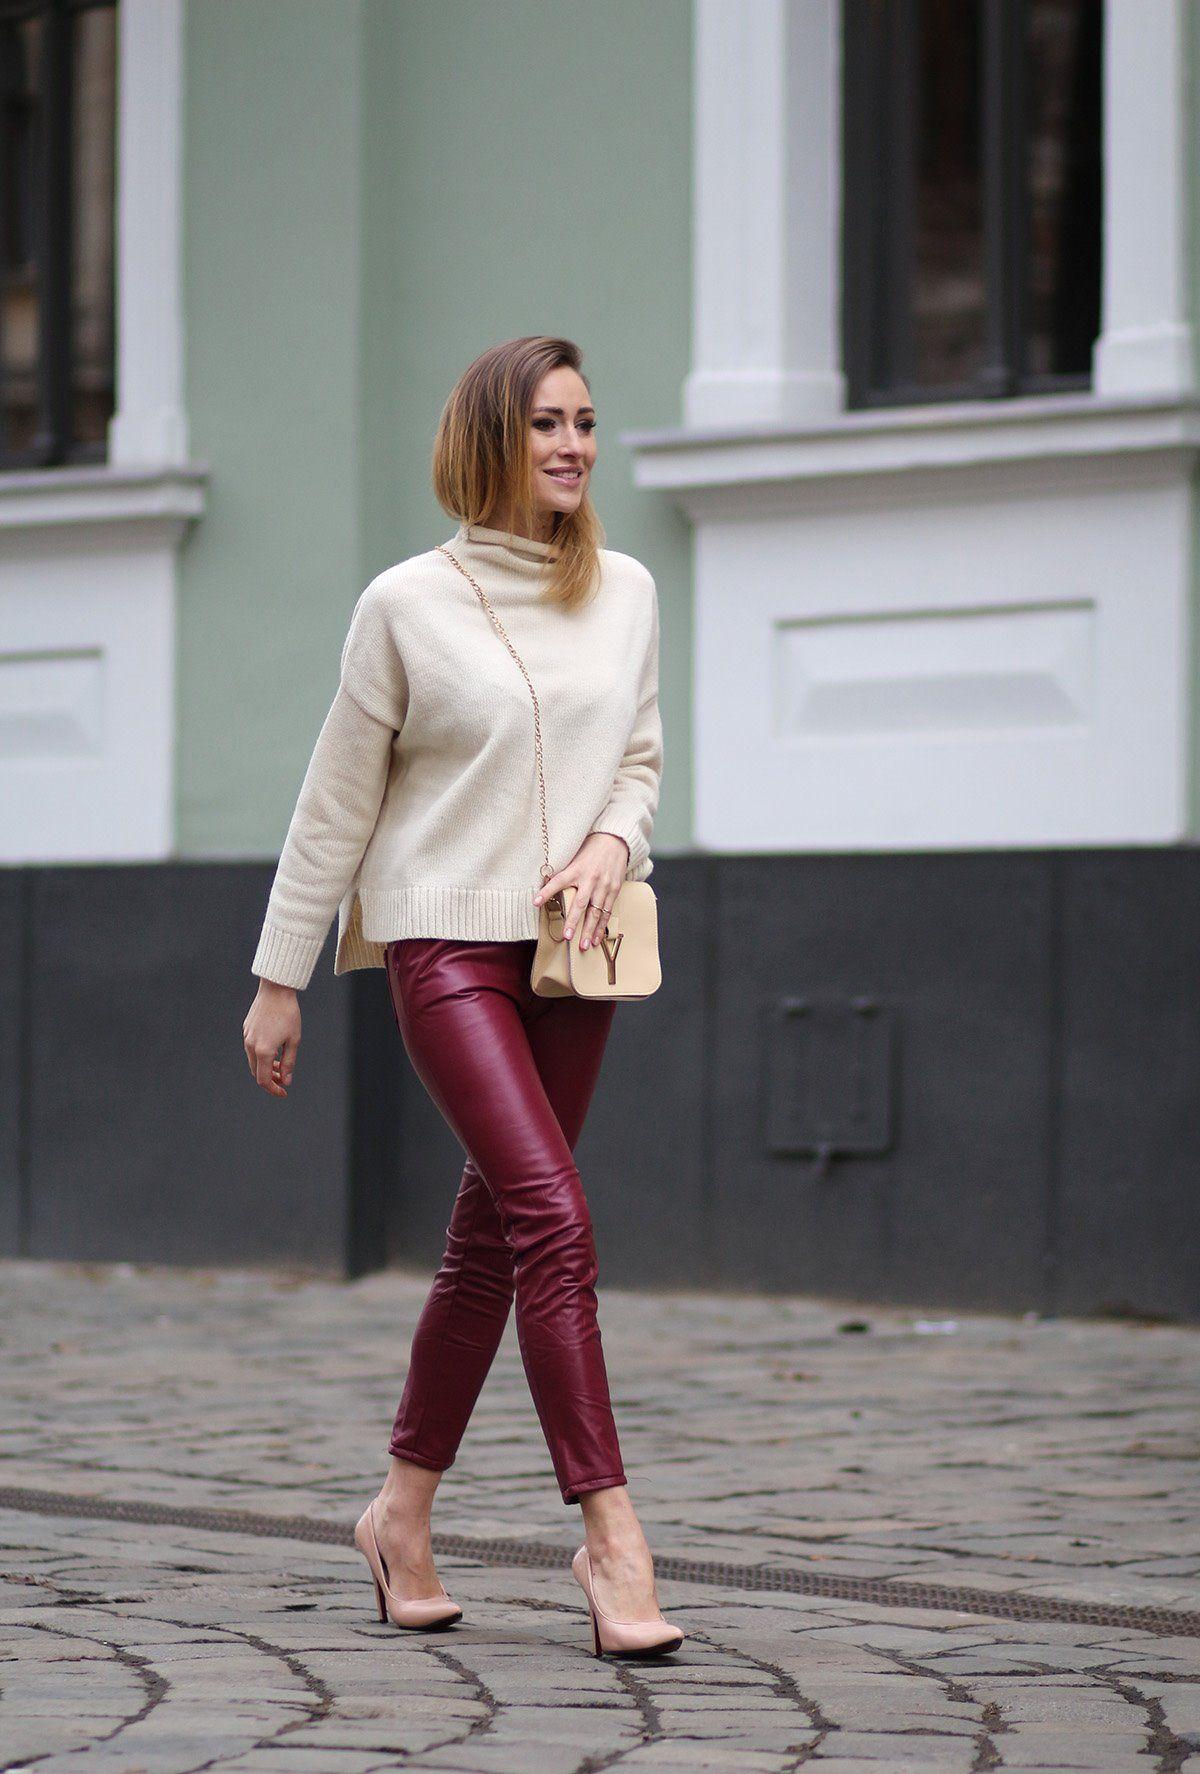 Ioana Chisiu Feminine Ways to Style Your Trousers